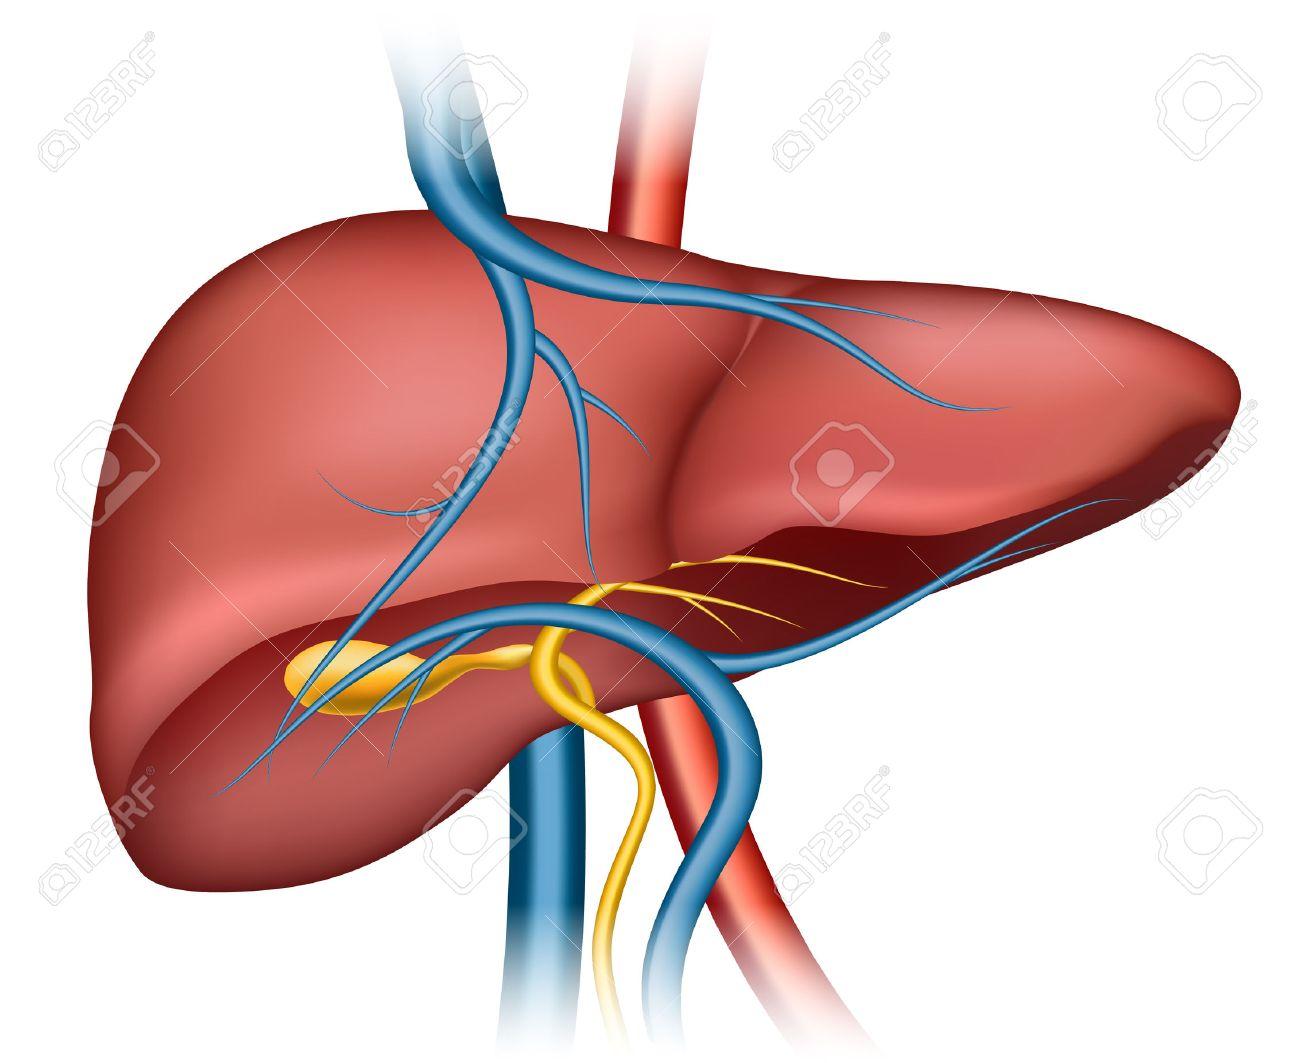 Human Liver Structure Organ Human Medical Science Health Internal